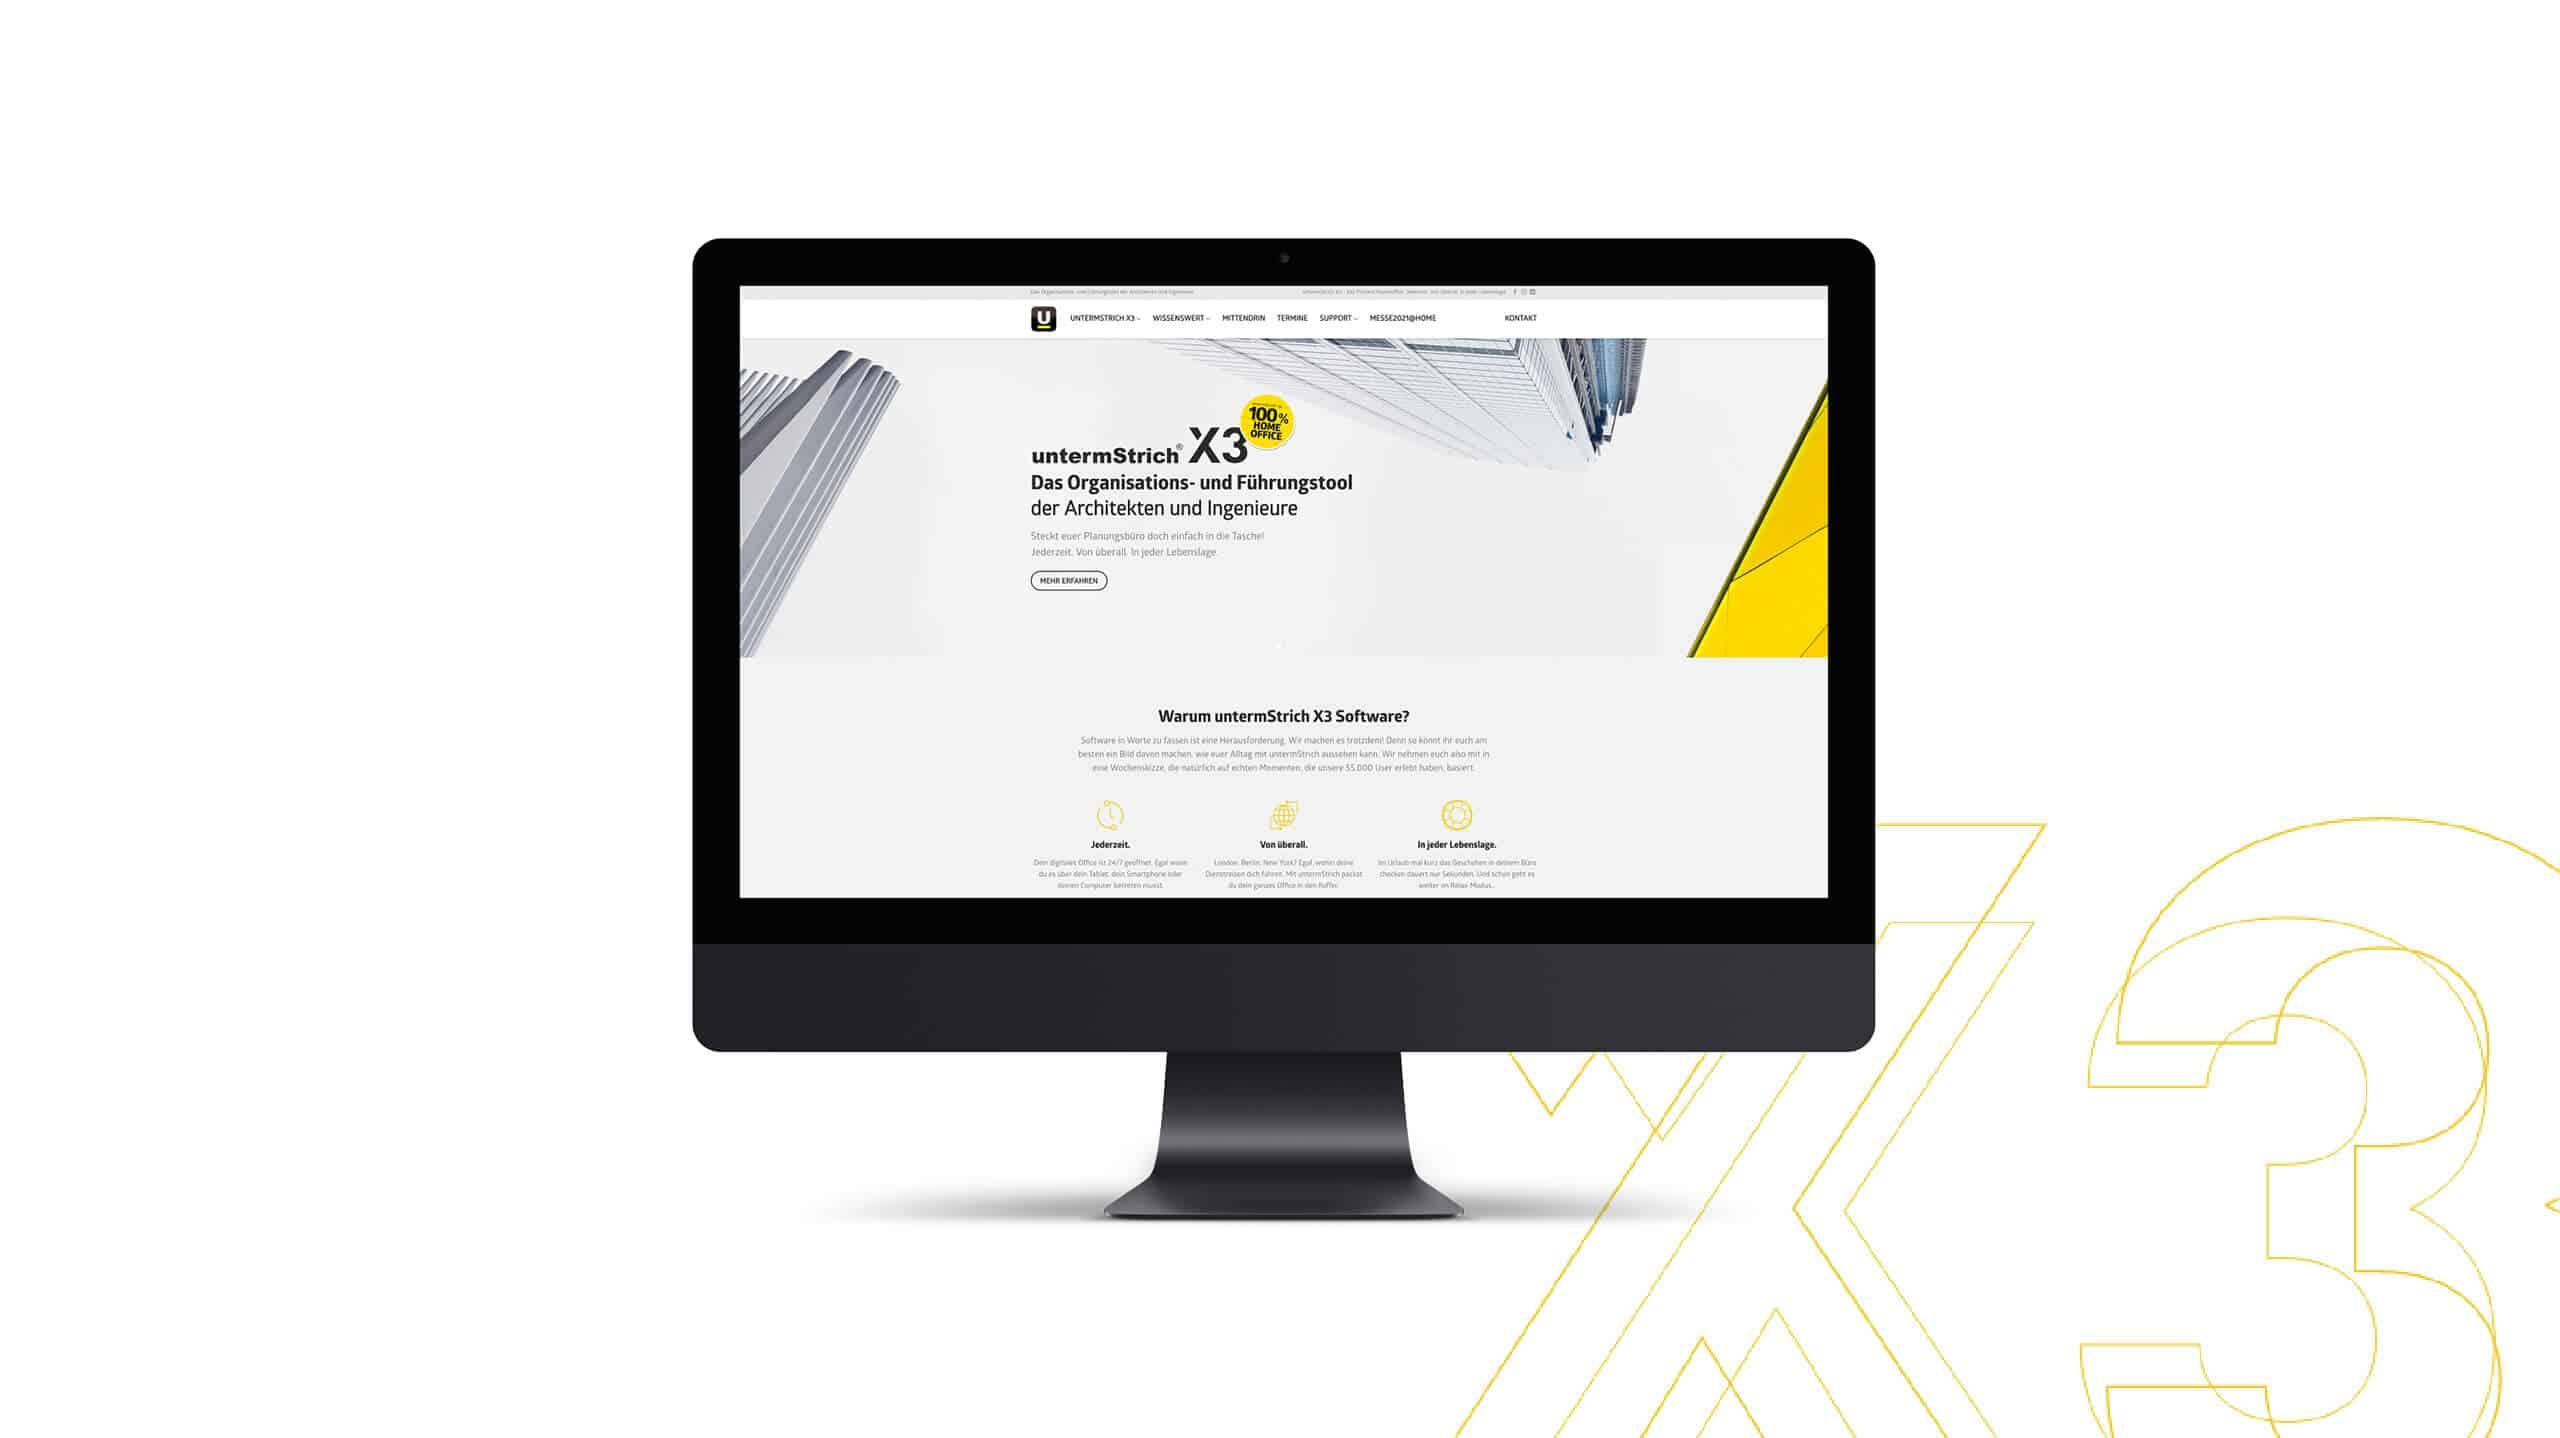 Webdesign | Desktop View | untermstrich.com